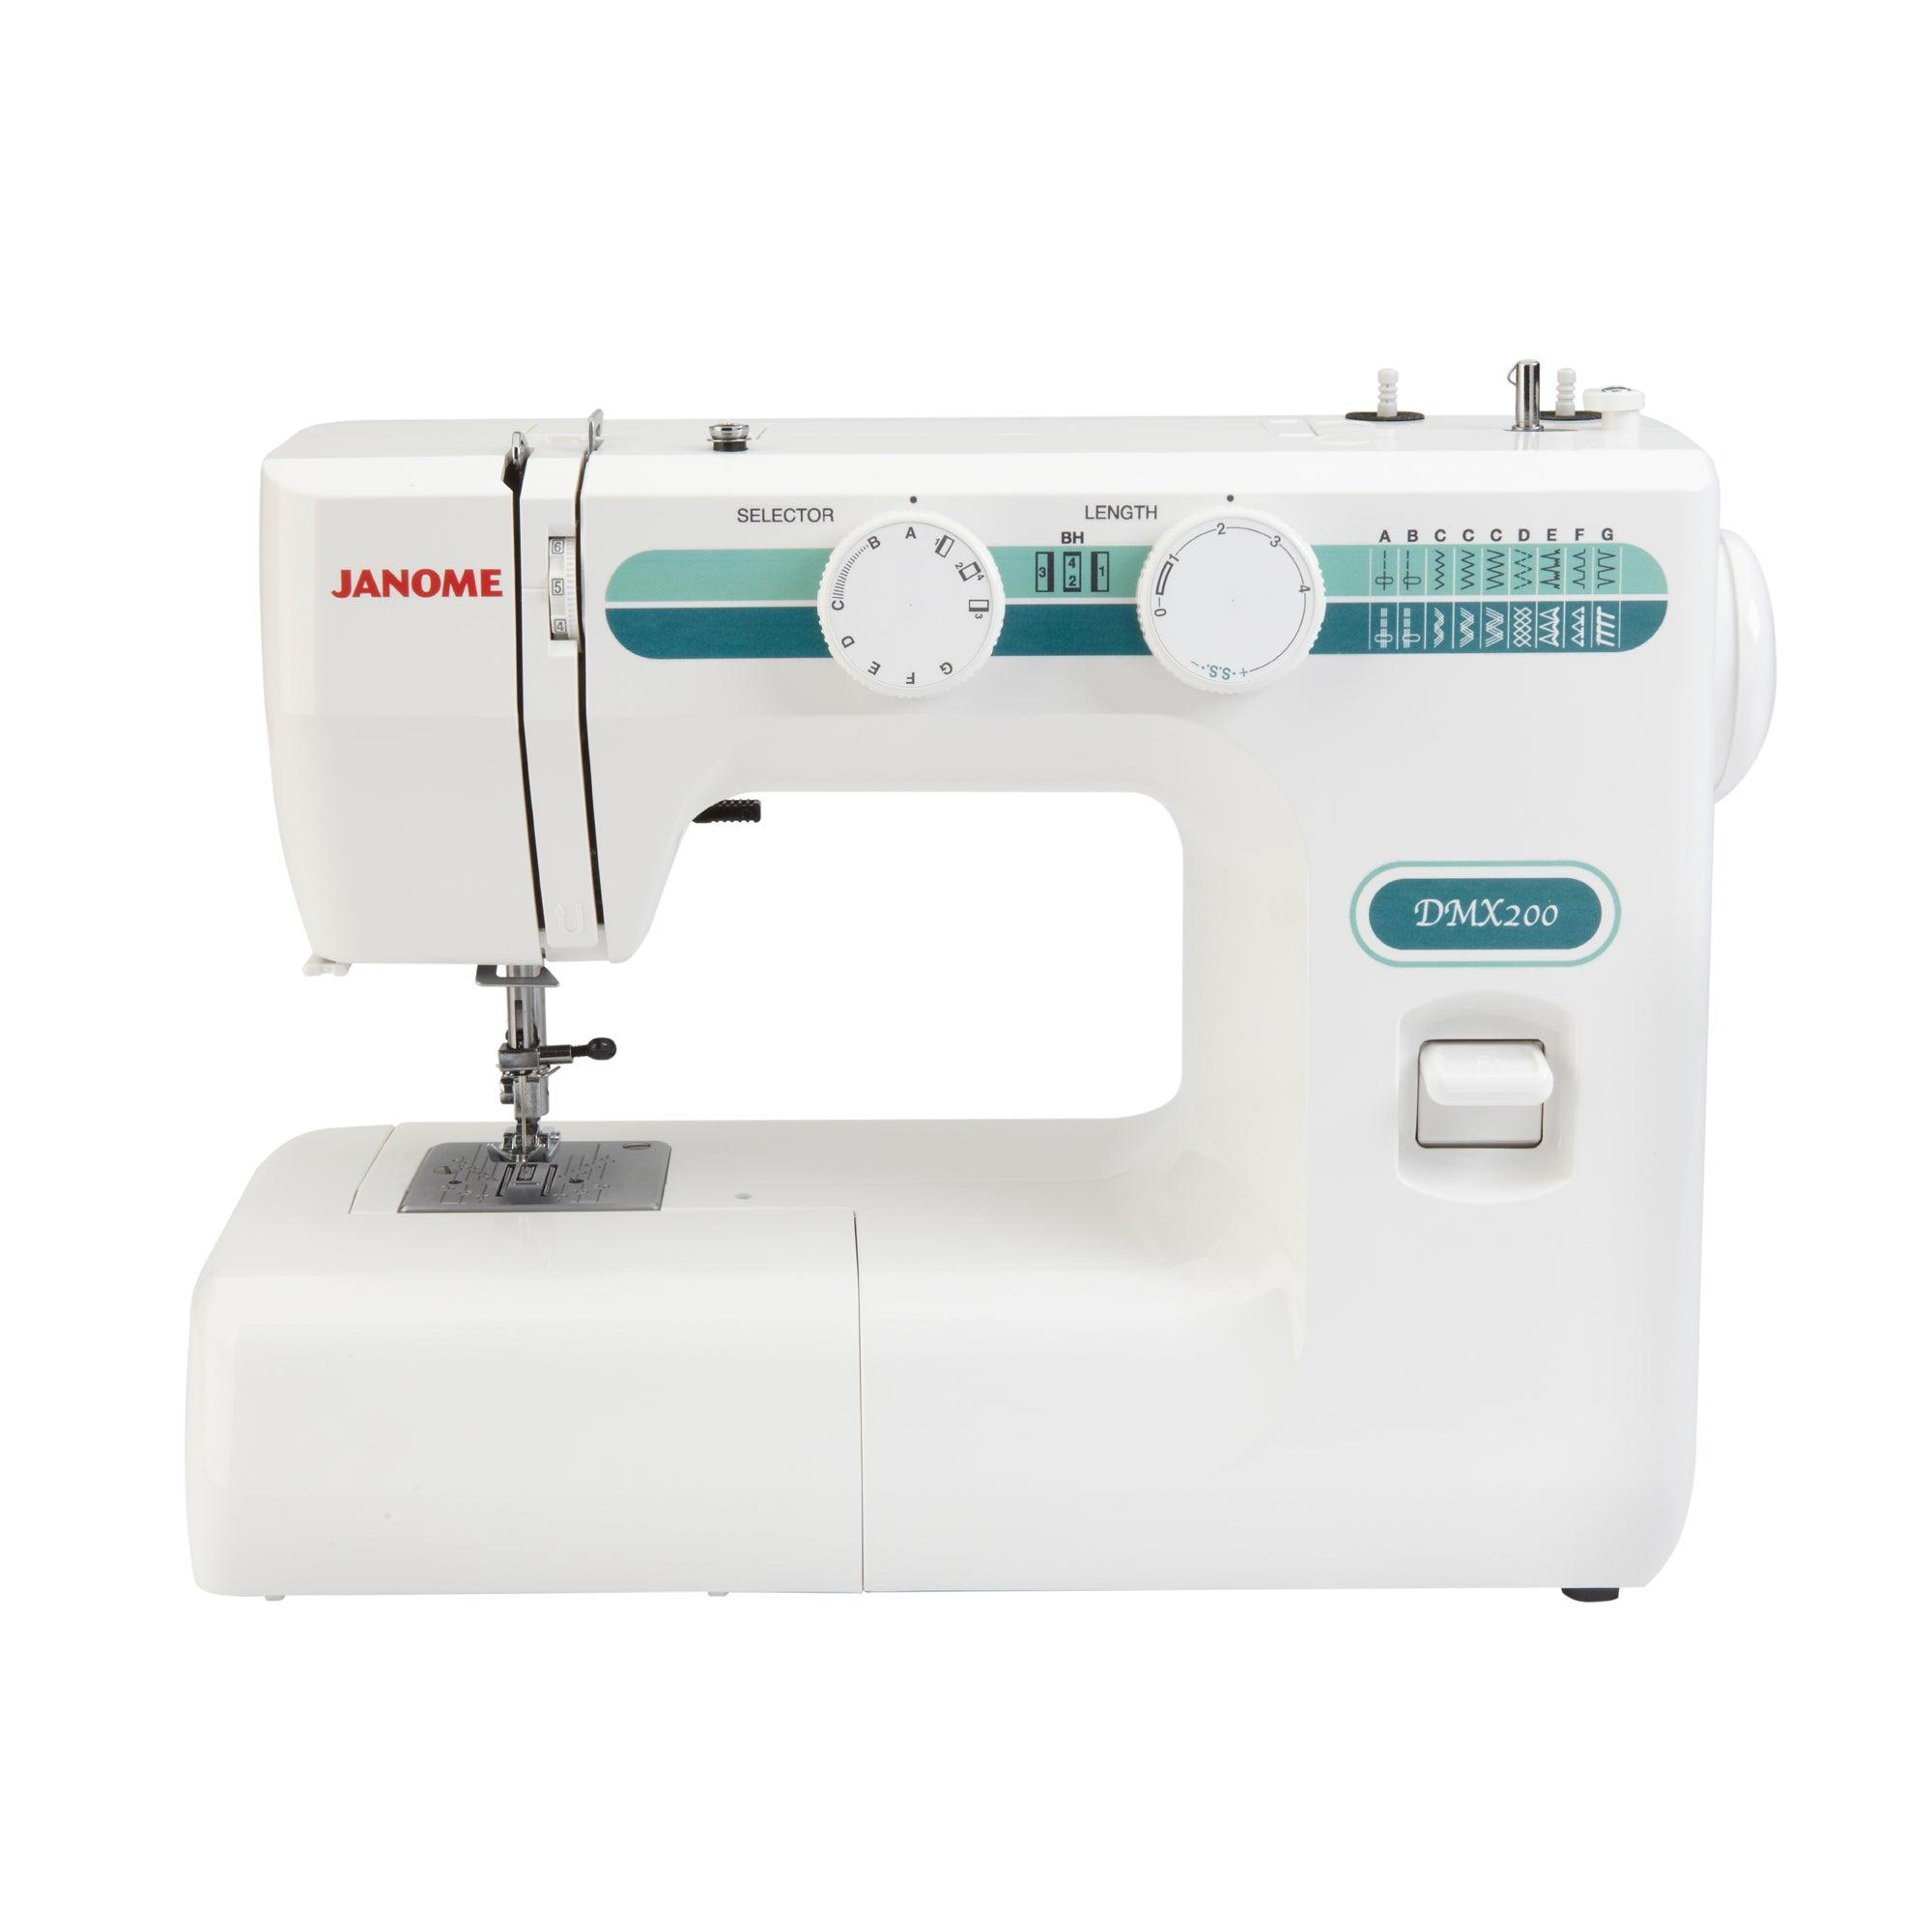 Janome DMX200 Sewing Machine White